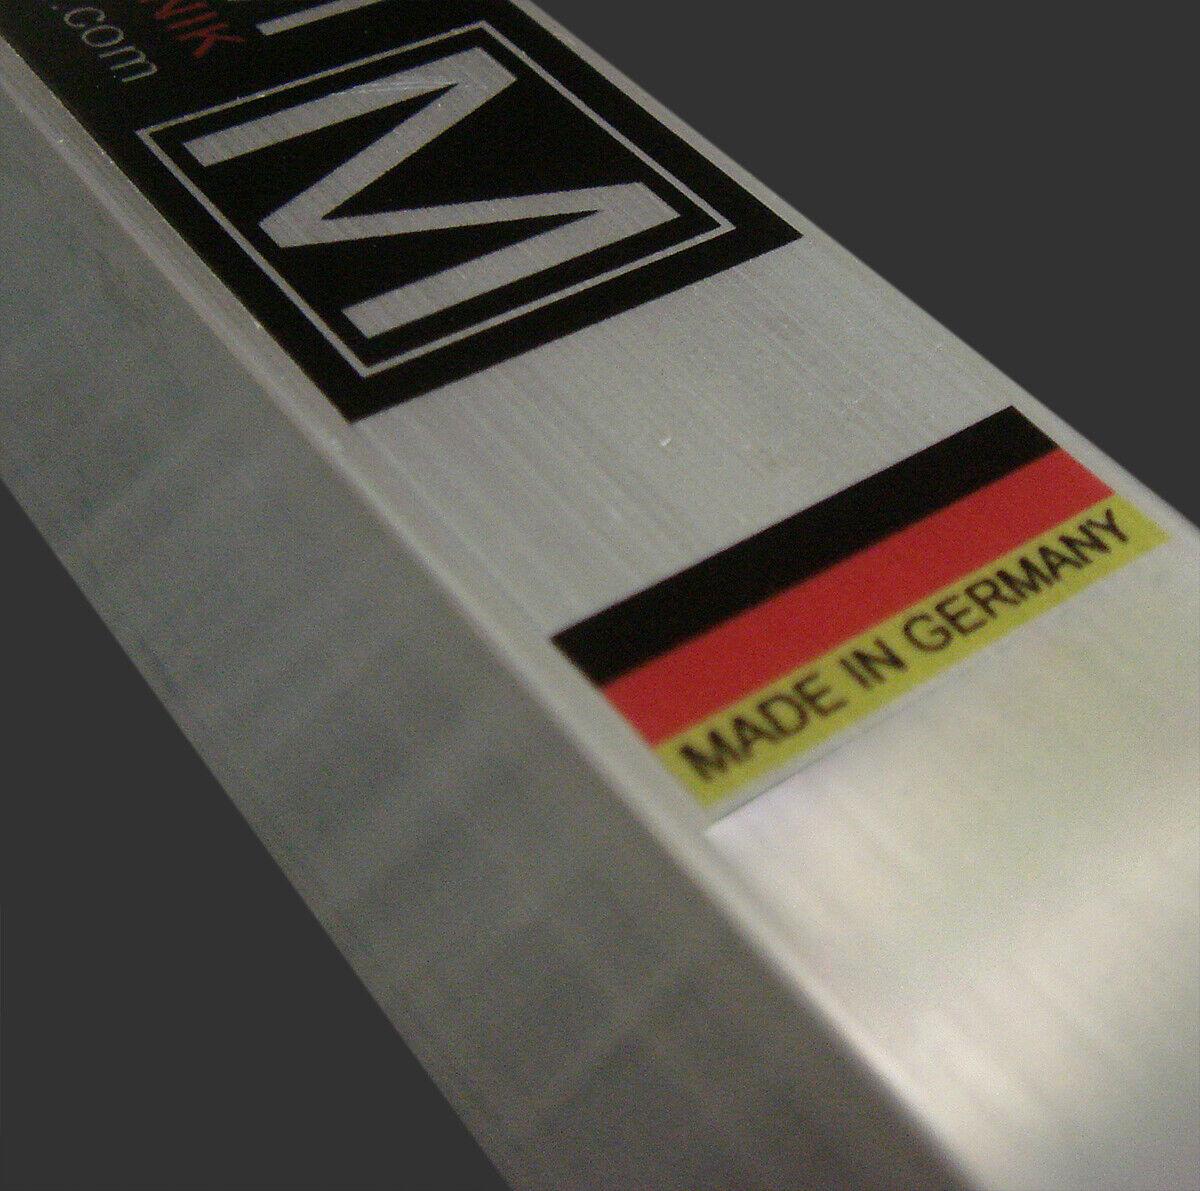 Hardtop-Ständer Mercedes W124 W208 CLK Hardtopständer Made in Germany Alu